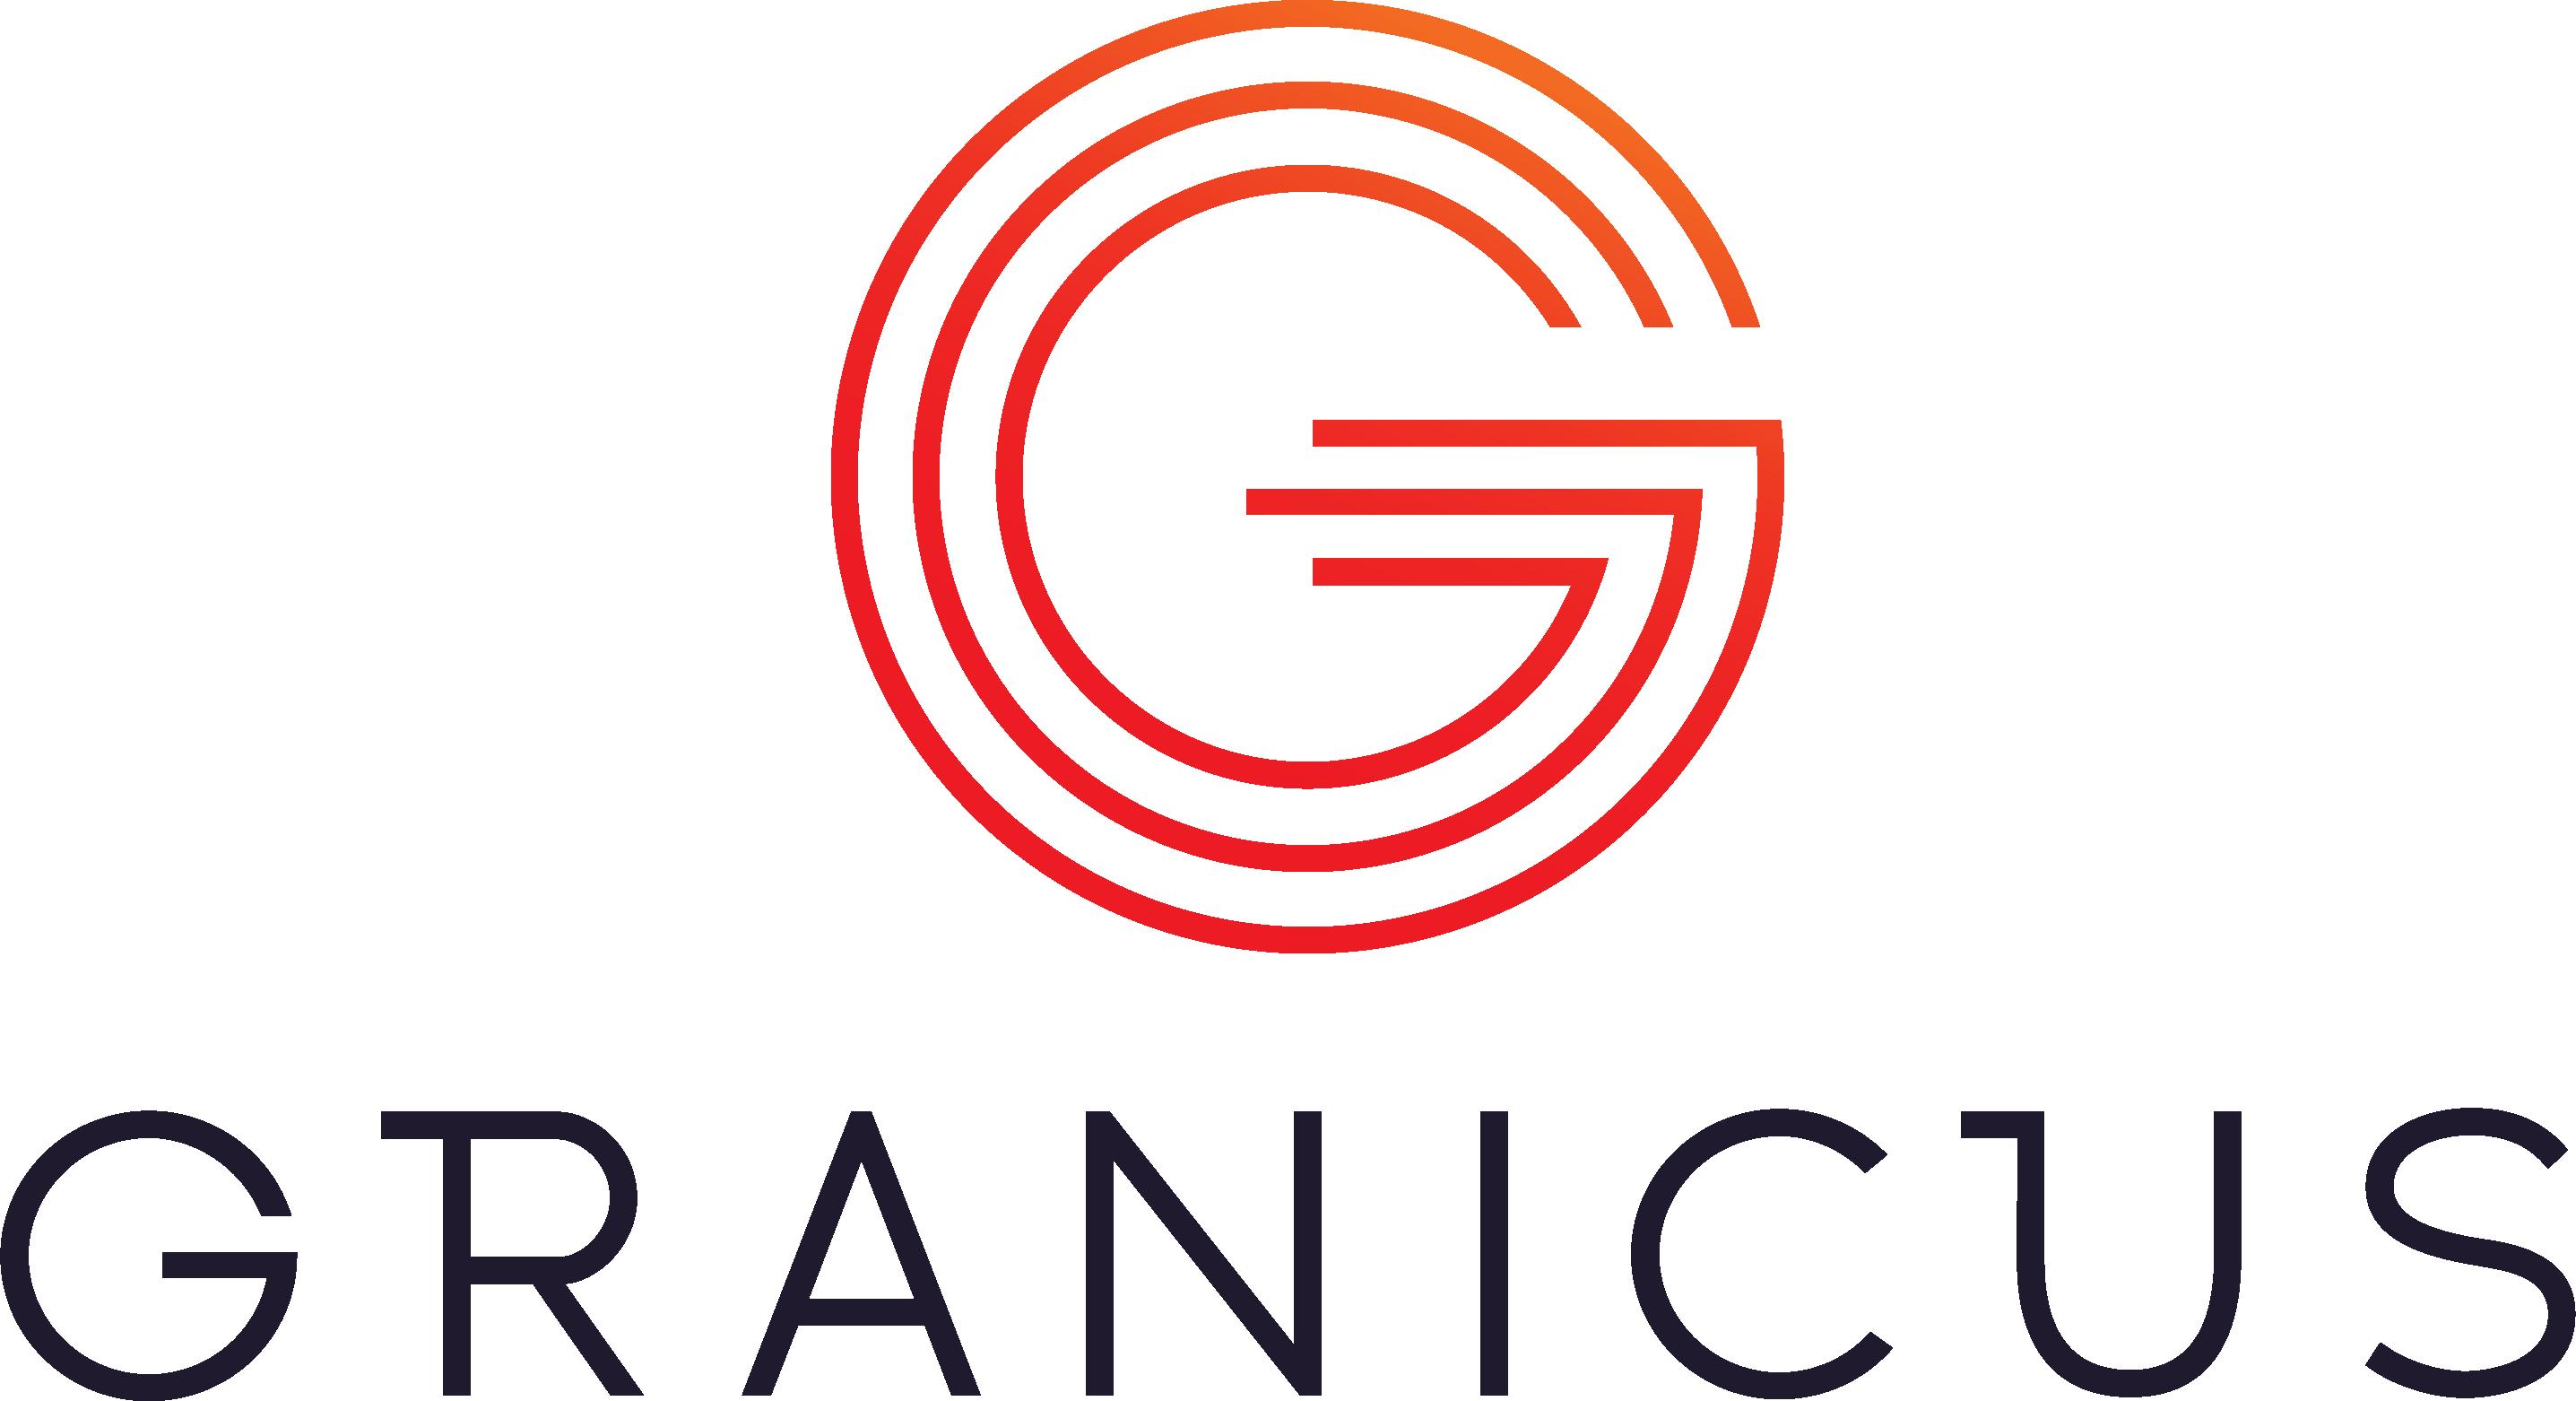 Granicus_Vertical_OnWhite.png